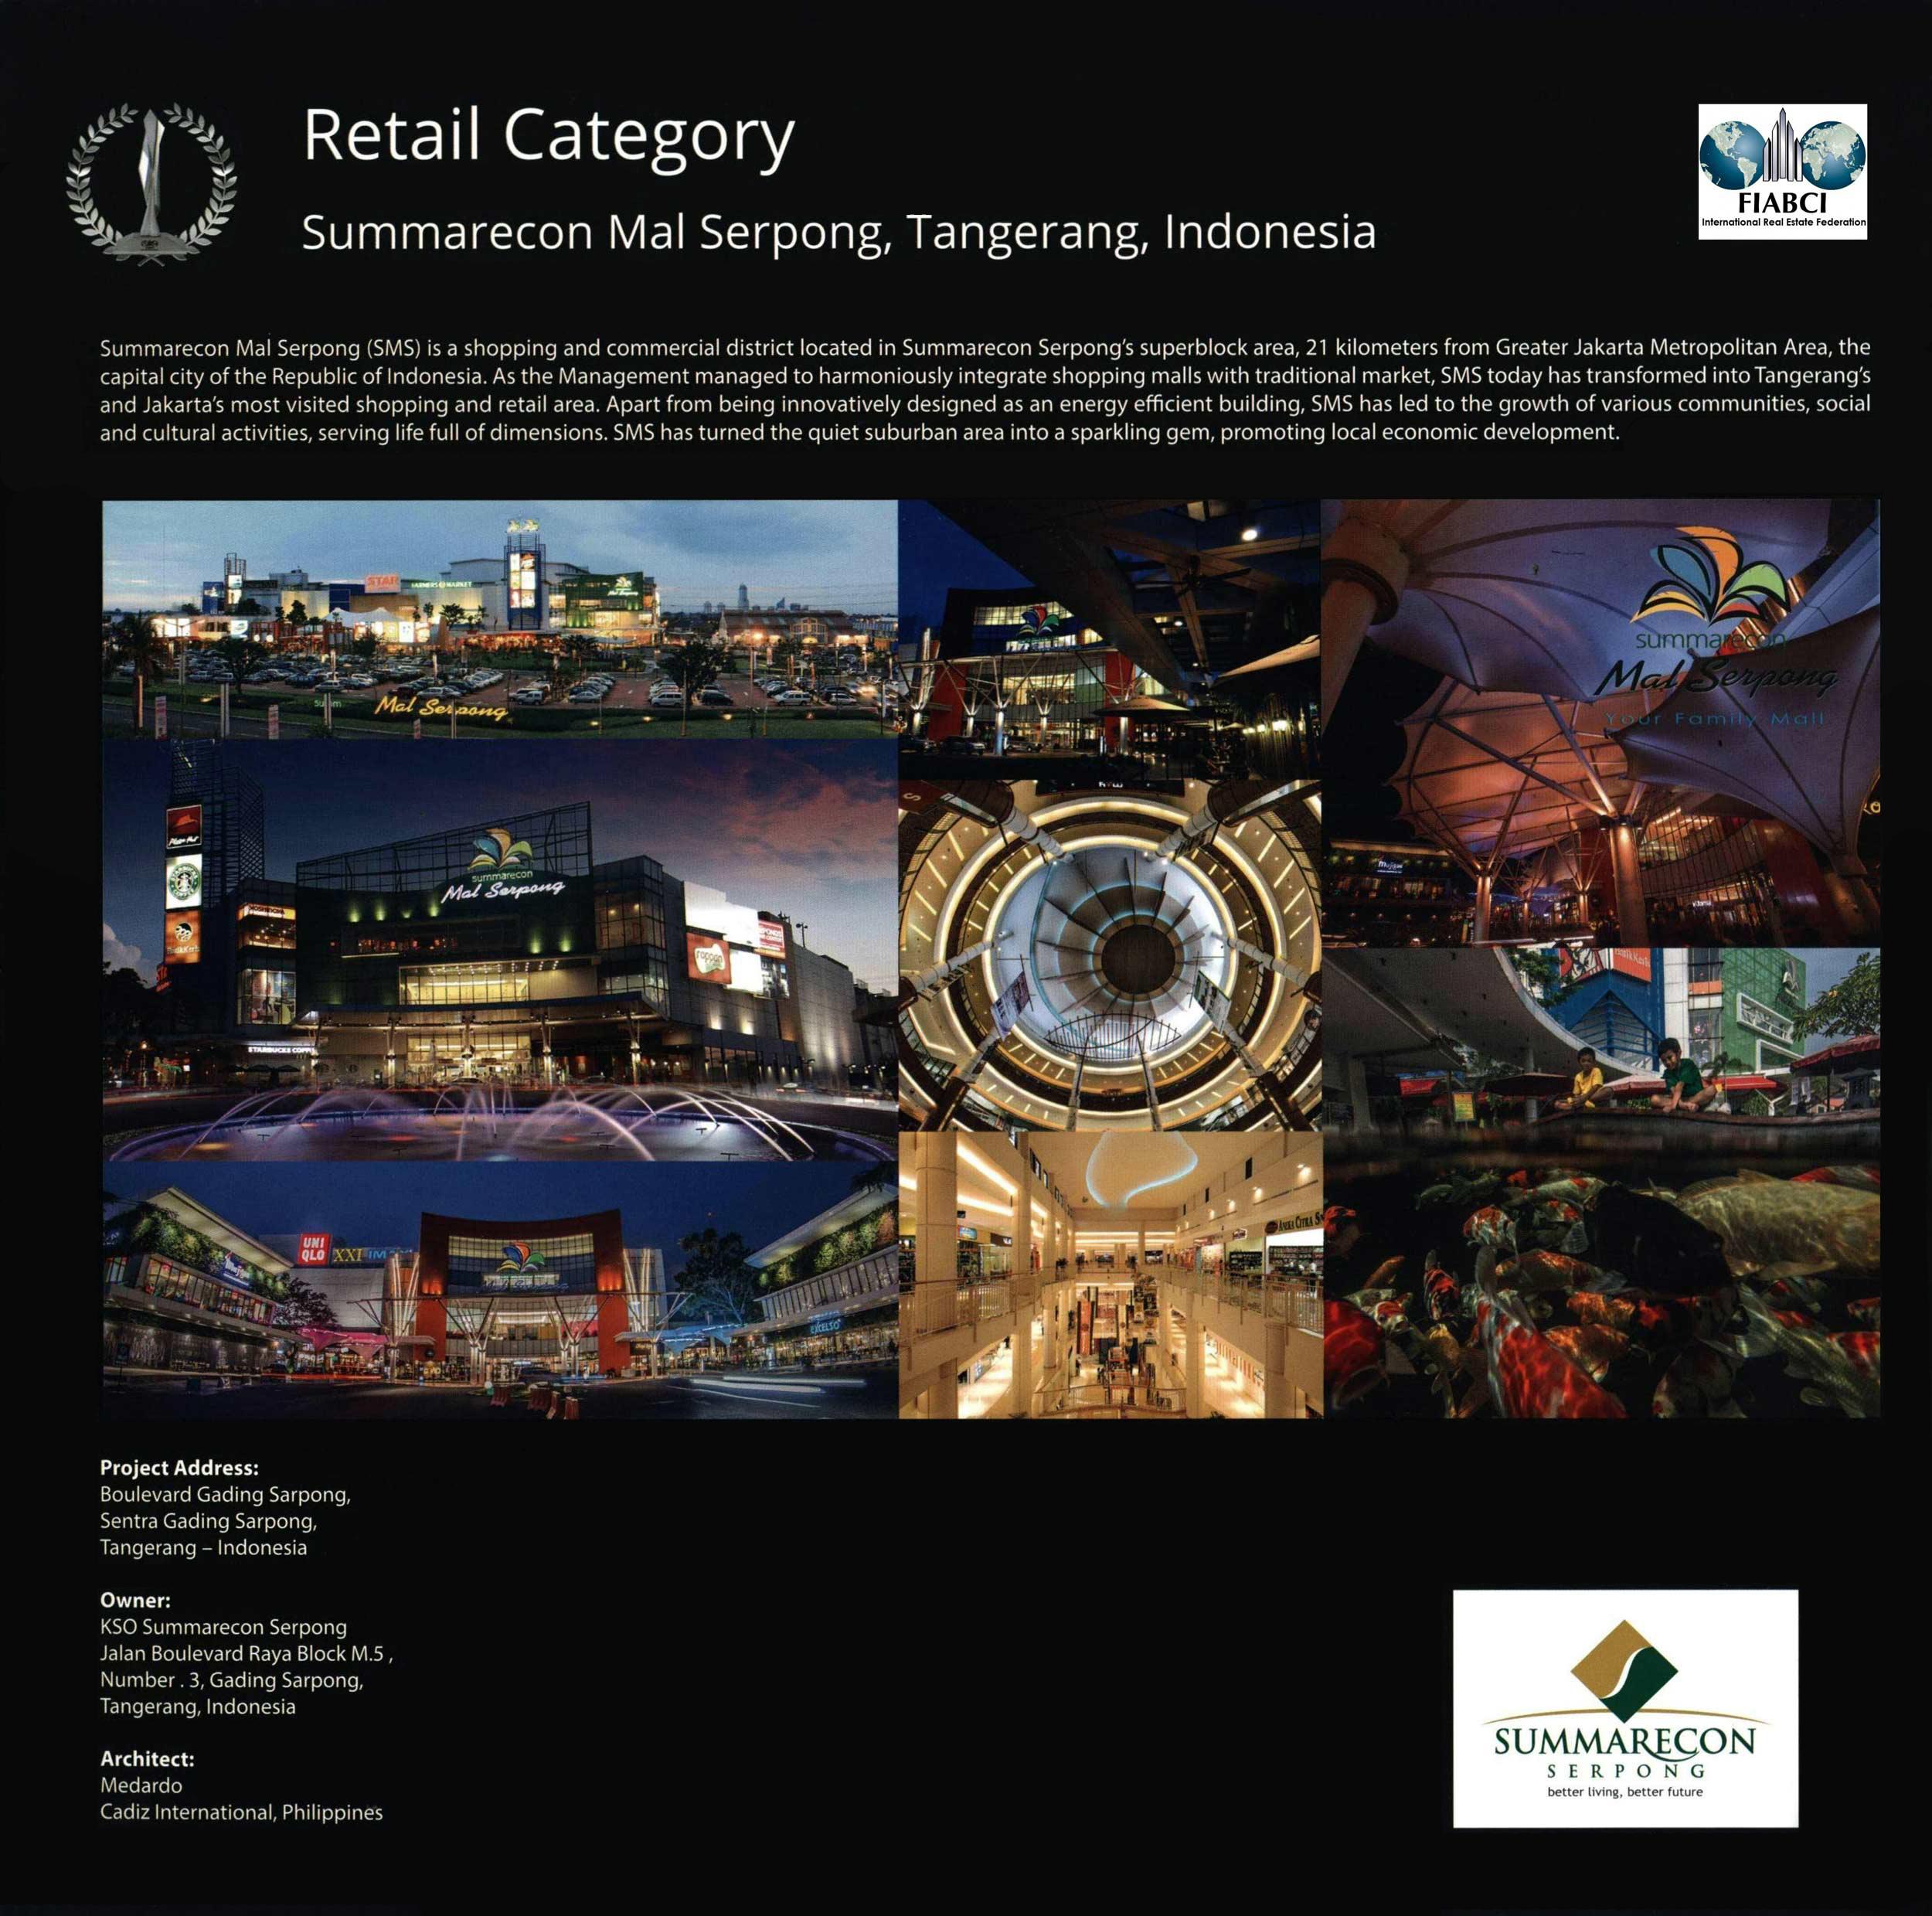 FIABCI-Retail-Category-SMS-52.jpg